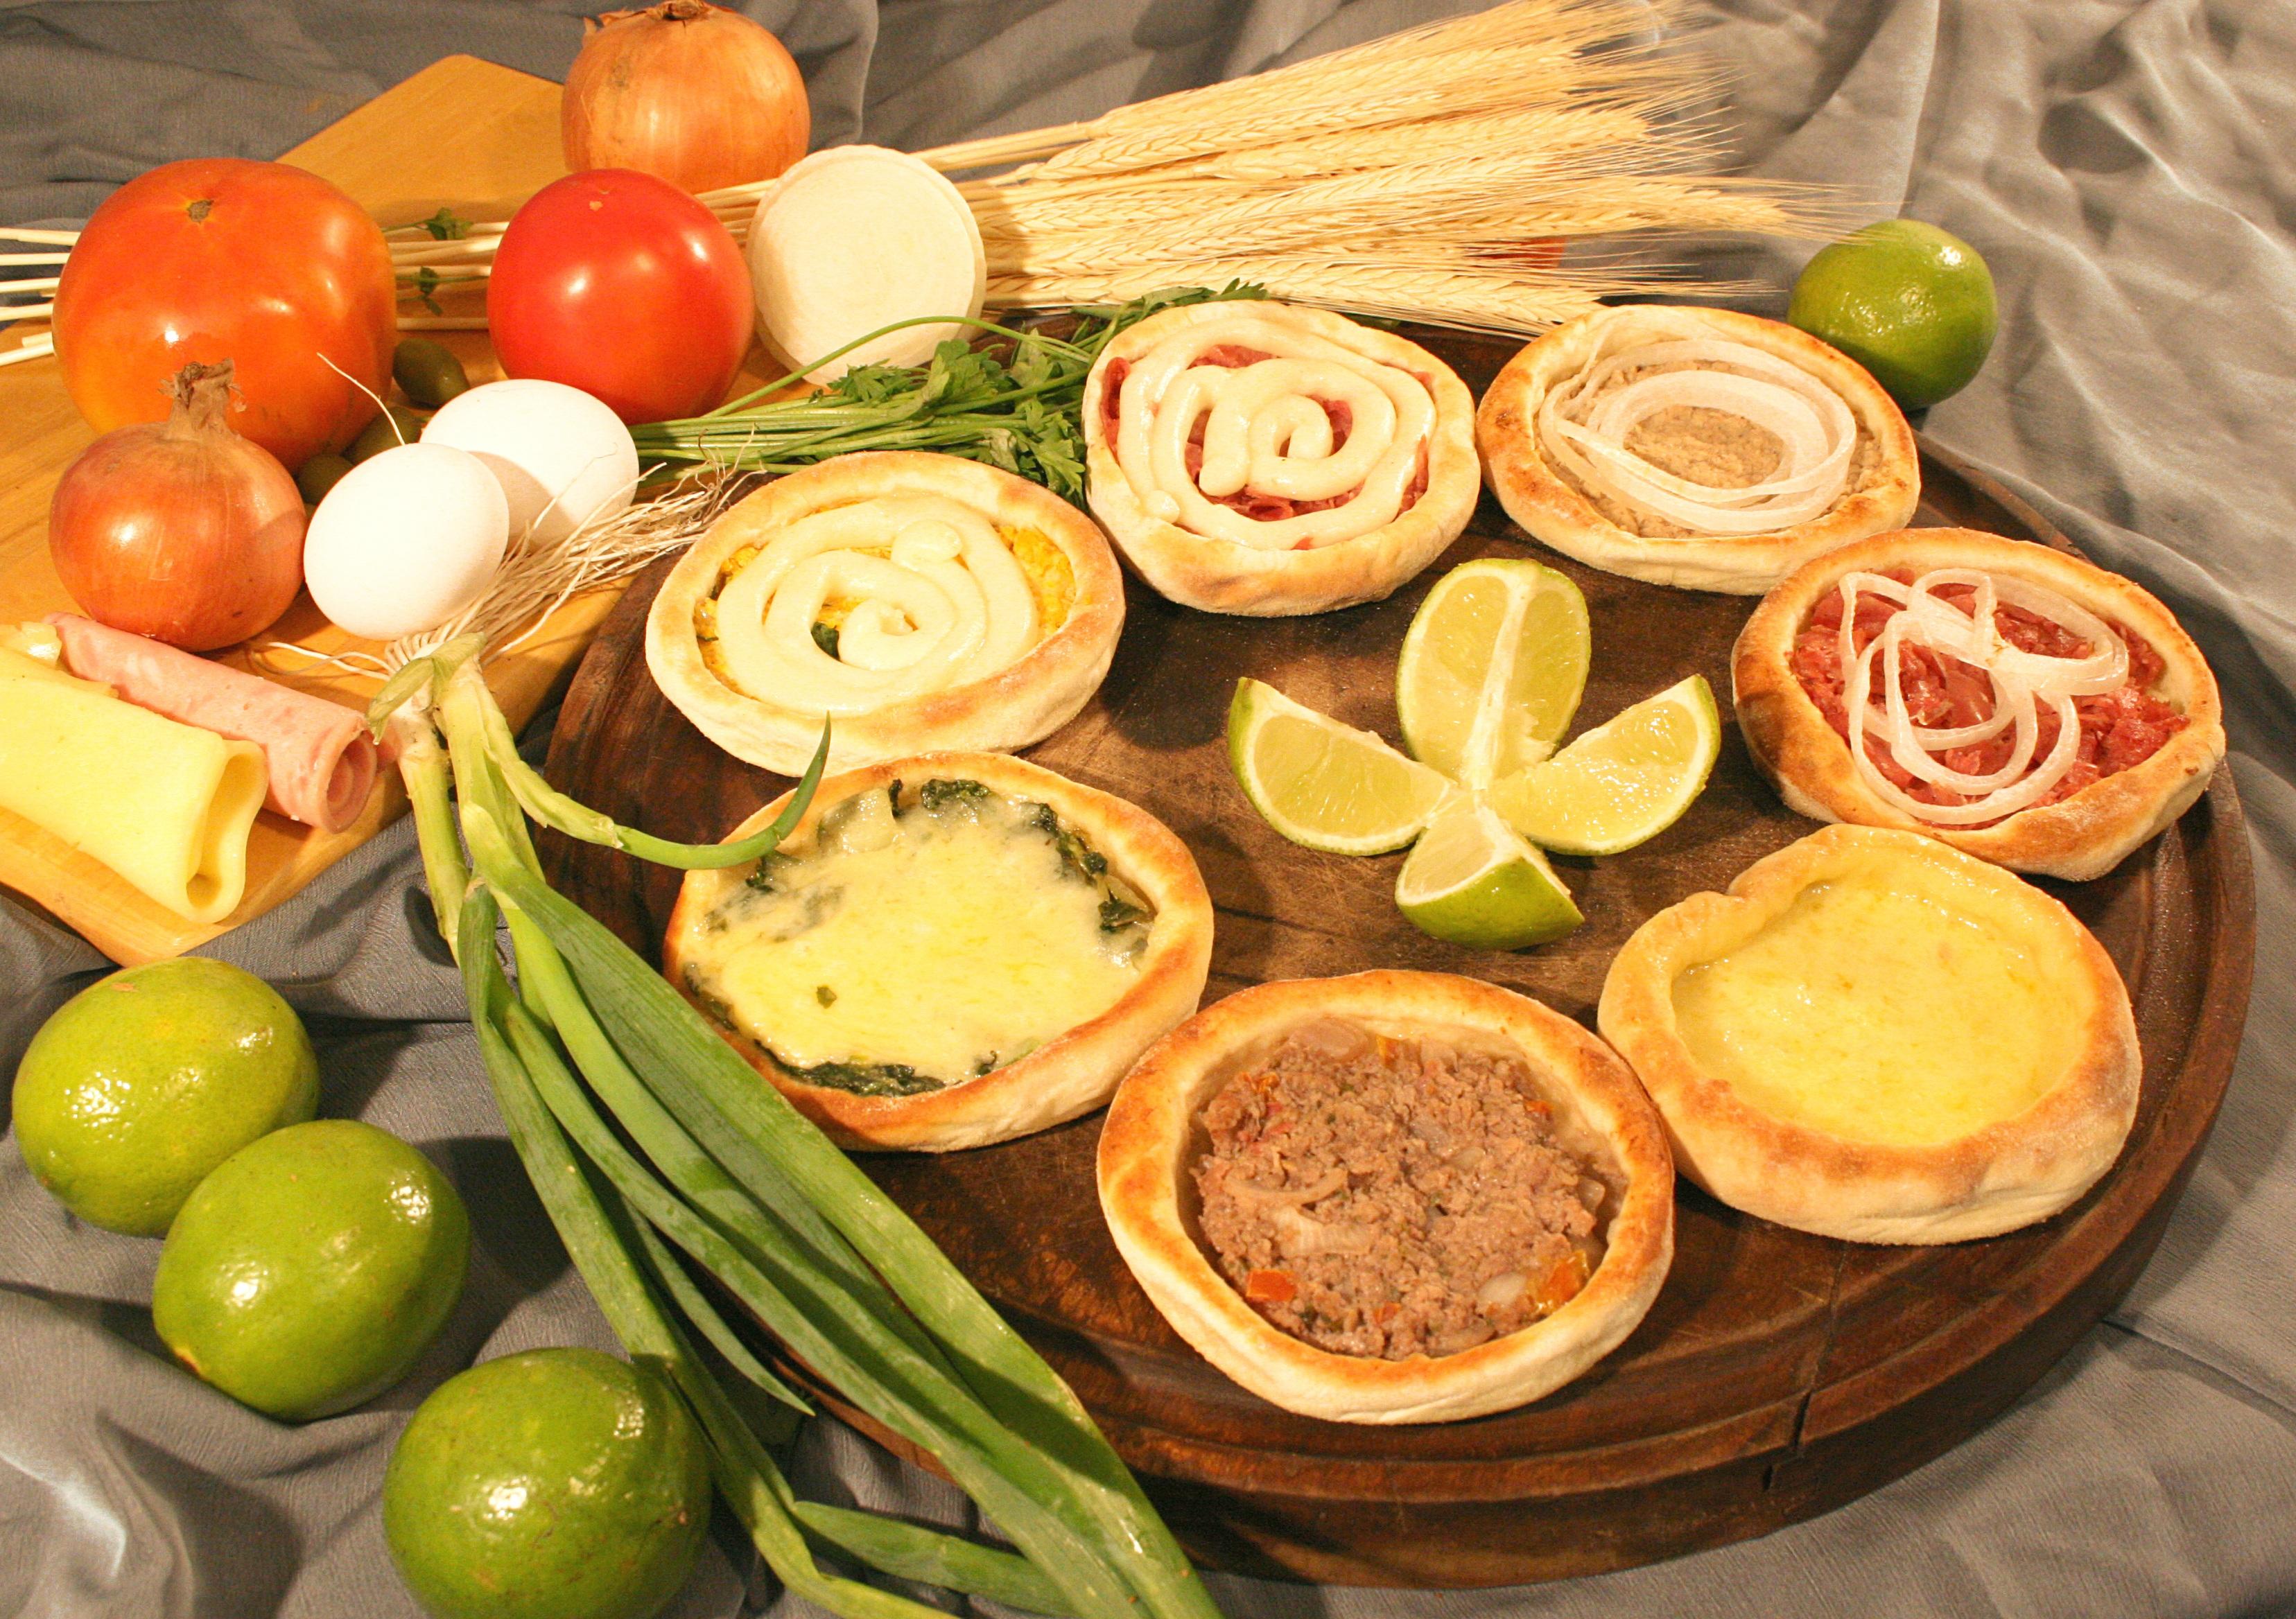 Fotos gratis : Fruta, plato, vegetal, receta, cocina, Pizza, adornar ...